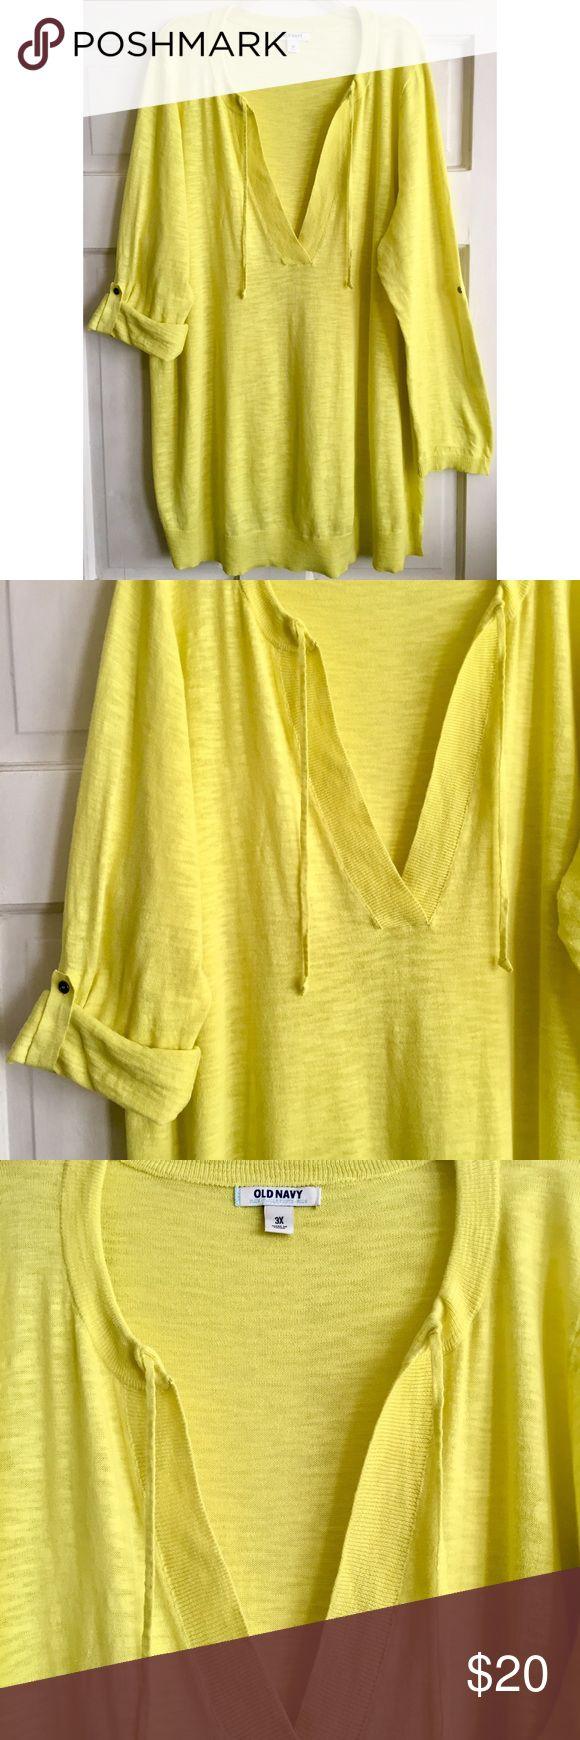 Yellow Tunic Sweater | Tunic sweater, Fabric tags and Hemline